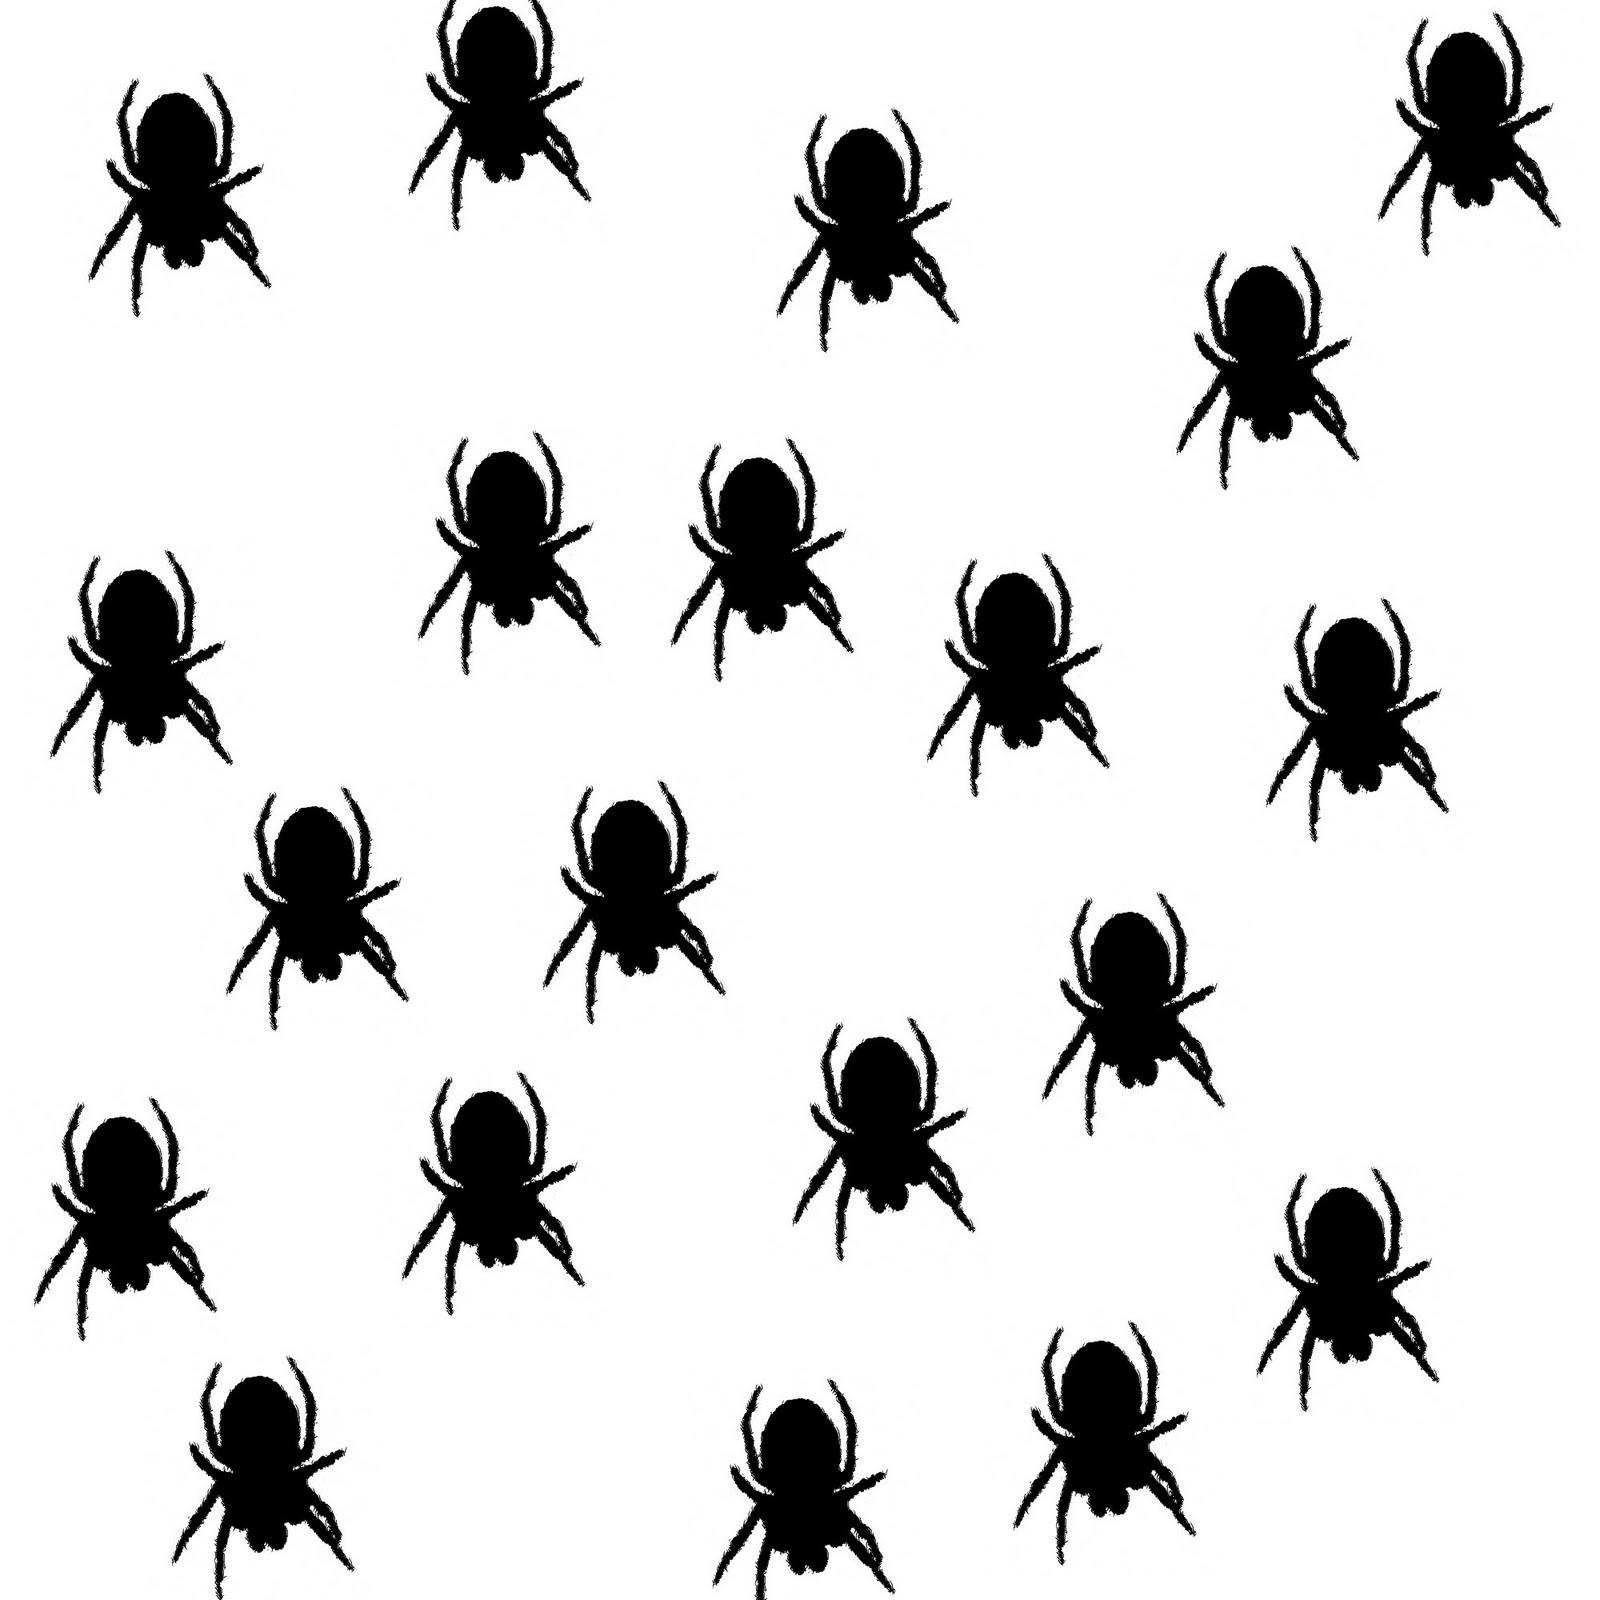 saraccino: Spider shadow stencil